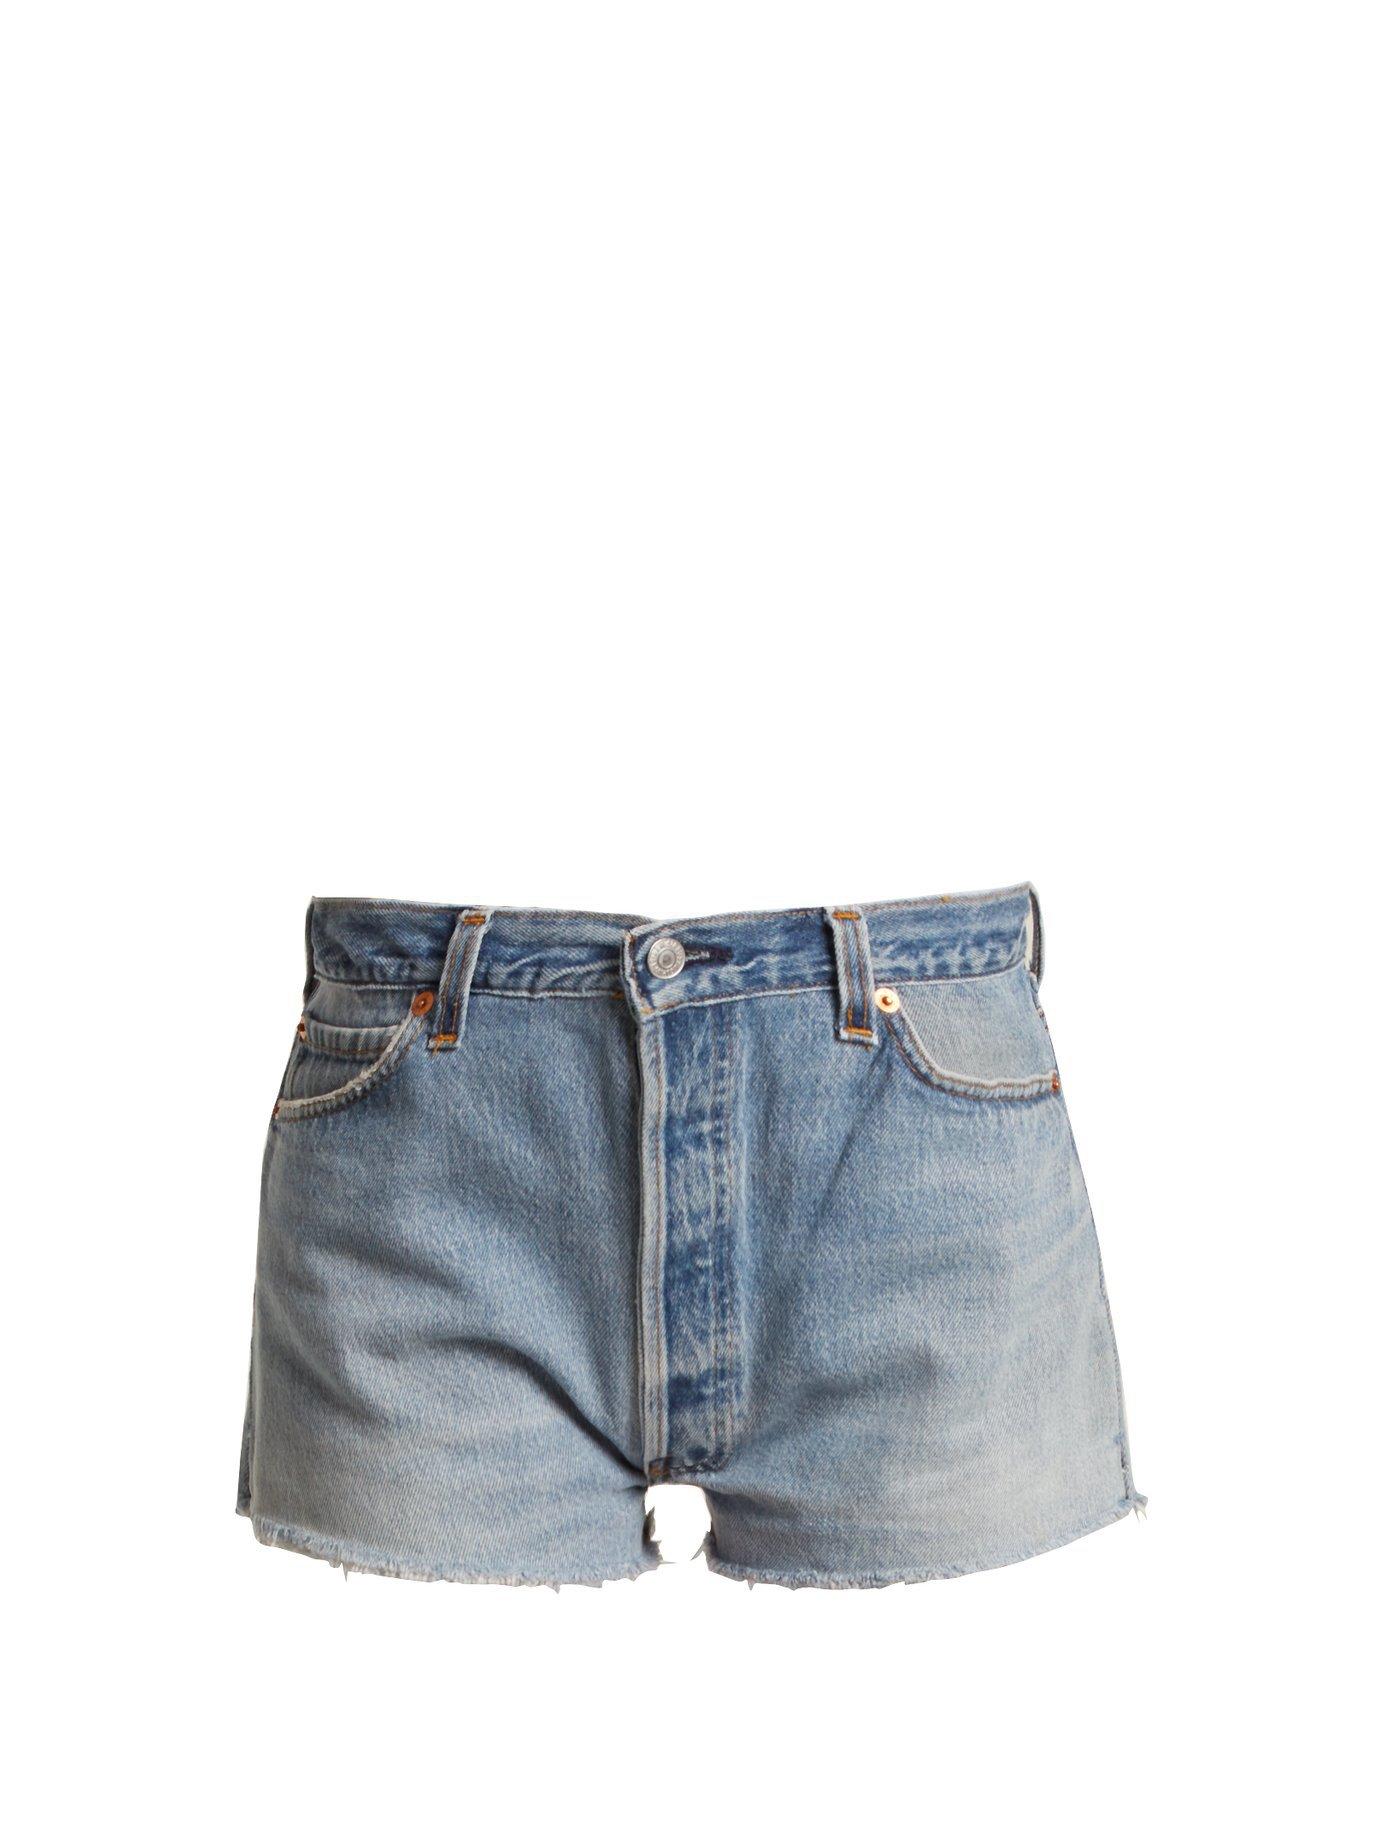 X Levi's The Short mid-rise denim shorts | Re/Done Originals | MATCHESFASHION.COM